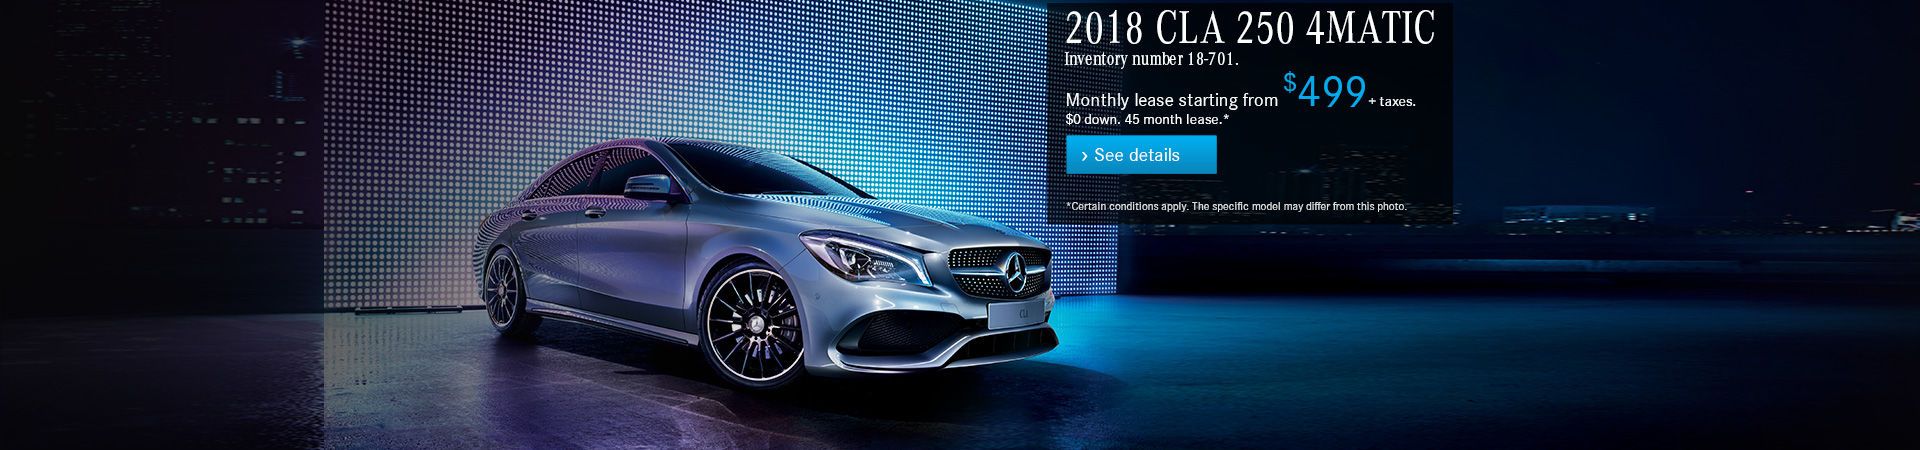 2018 CLA 250 4 MATIC